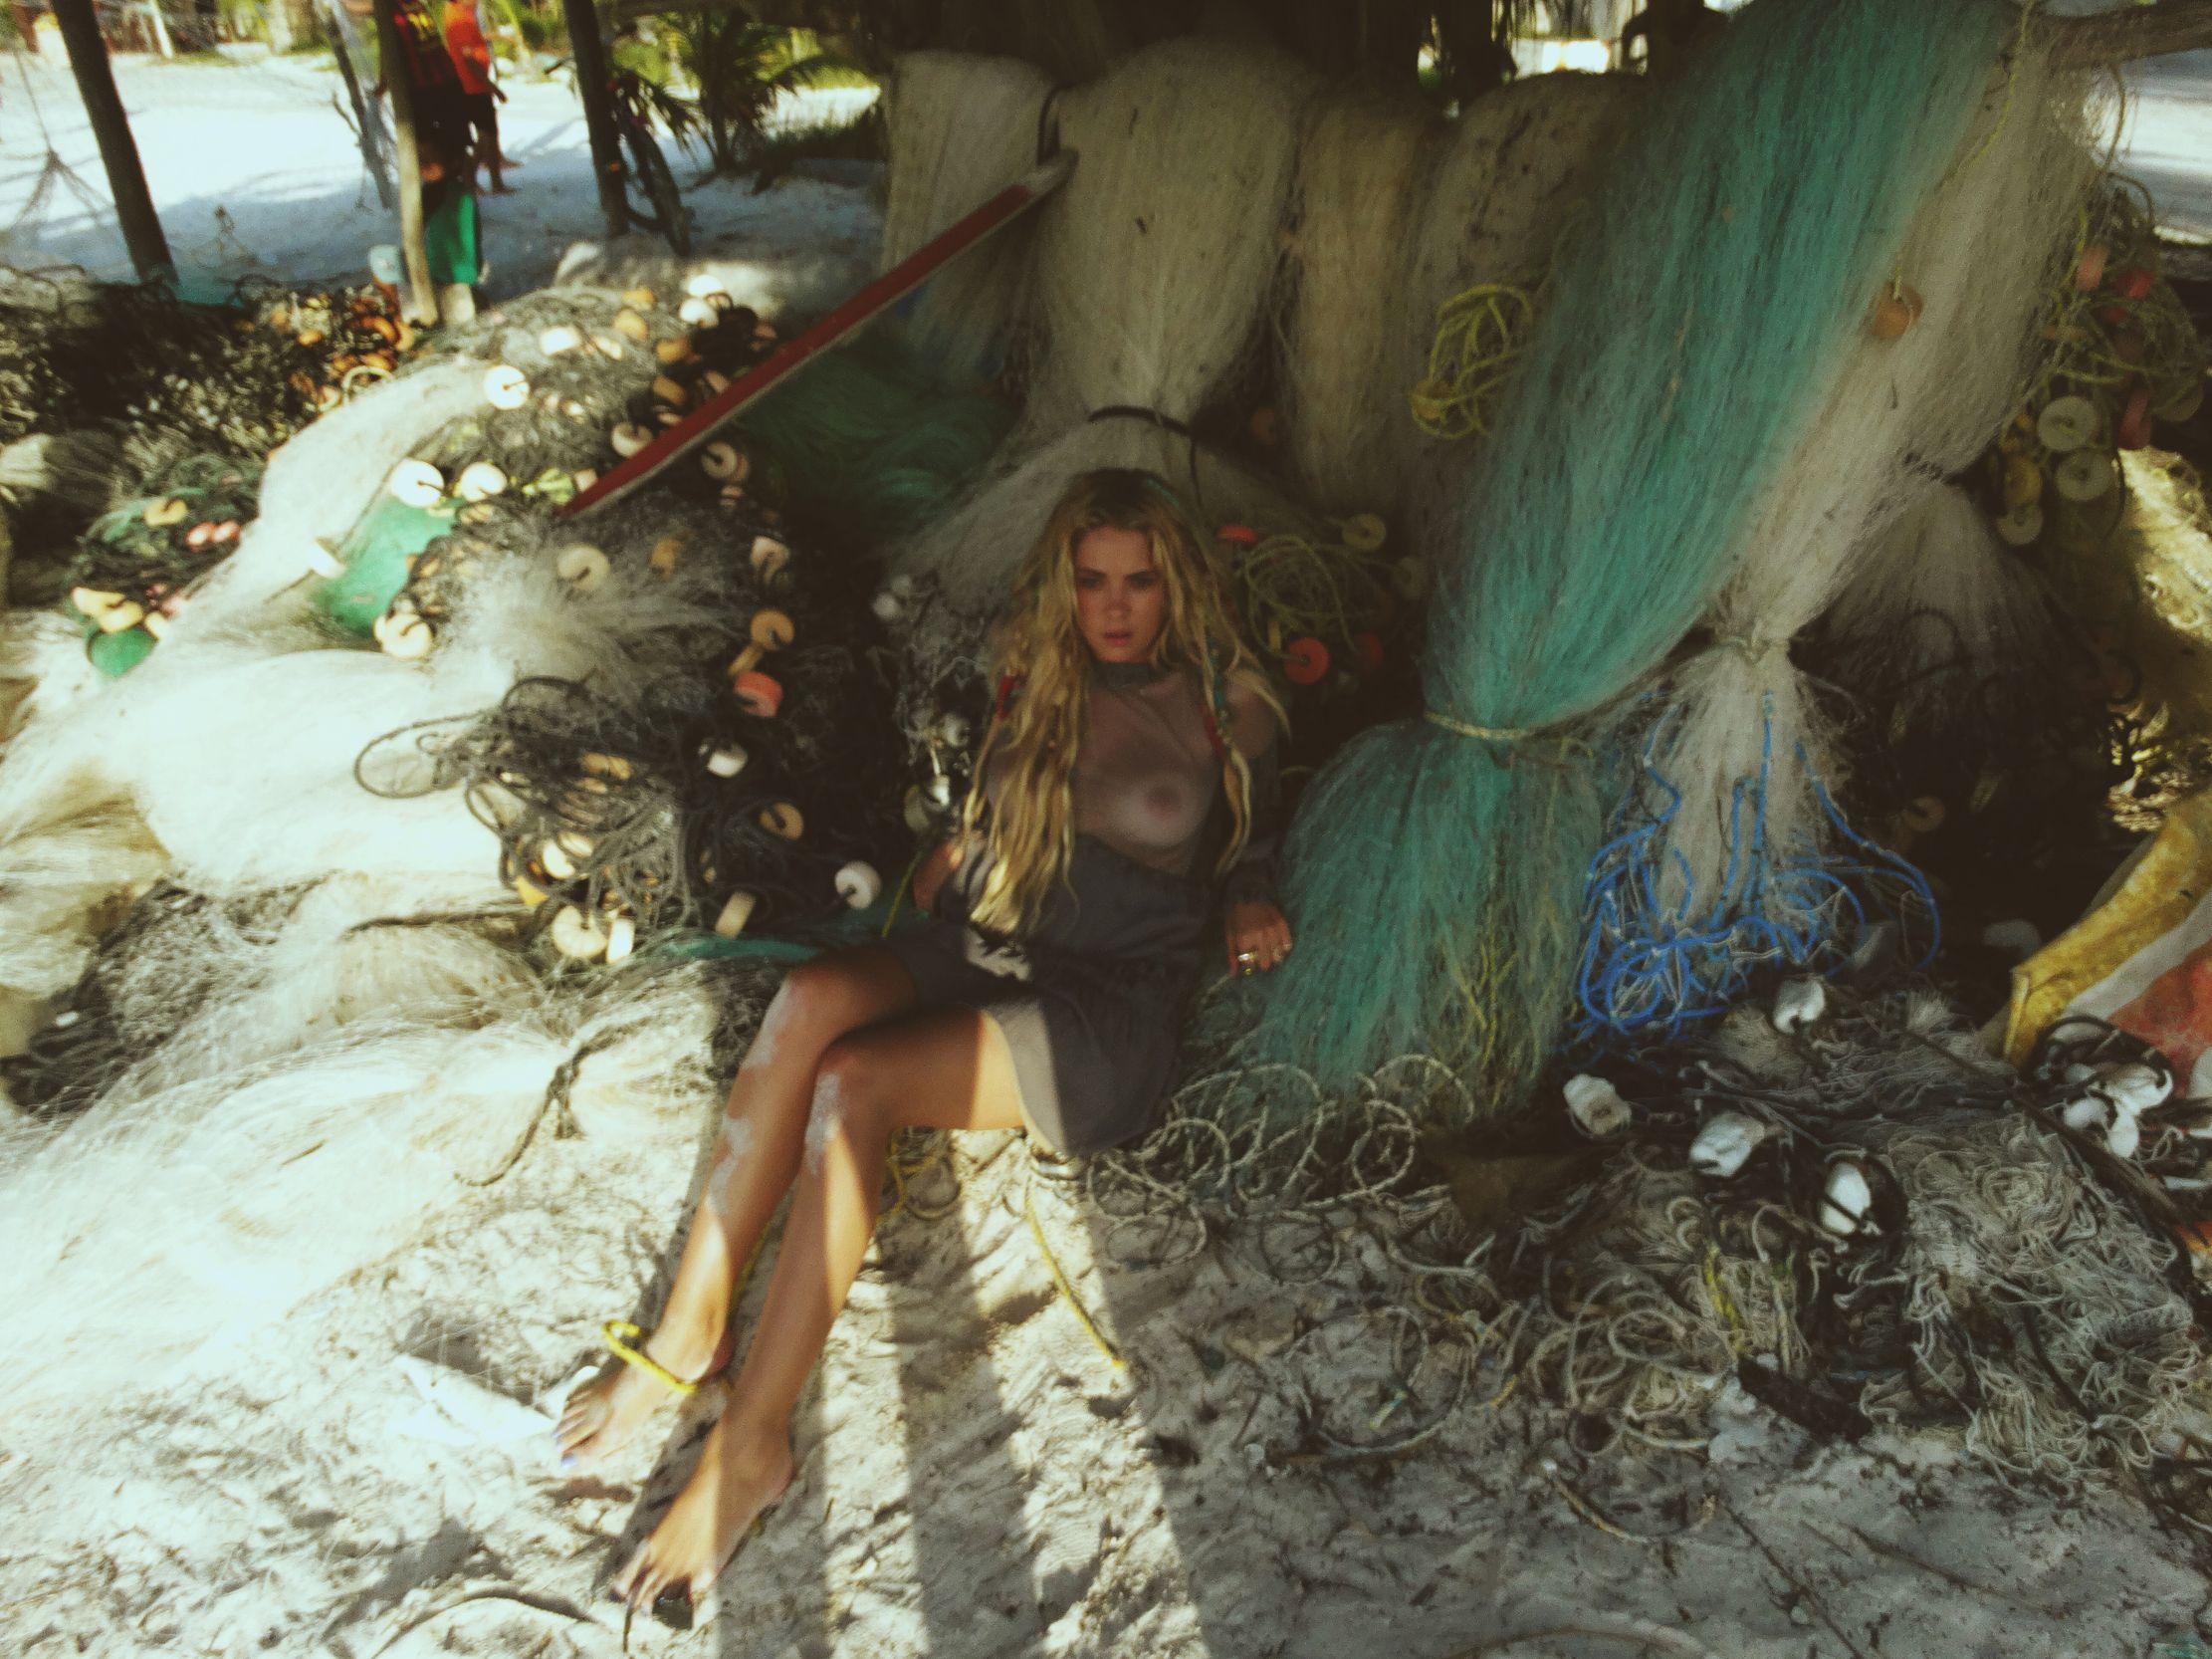 Ashley-Benson-Tits-1